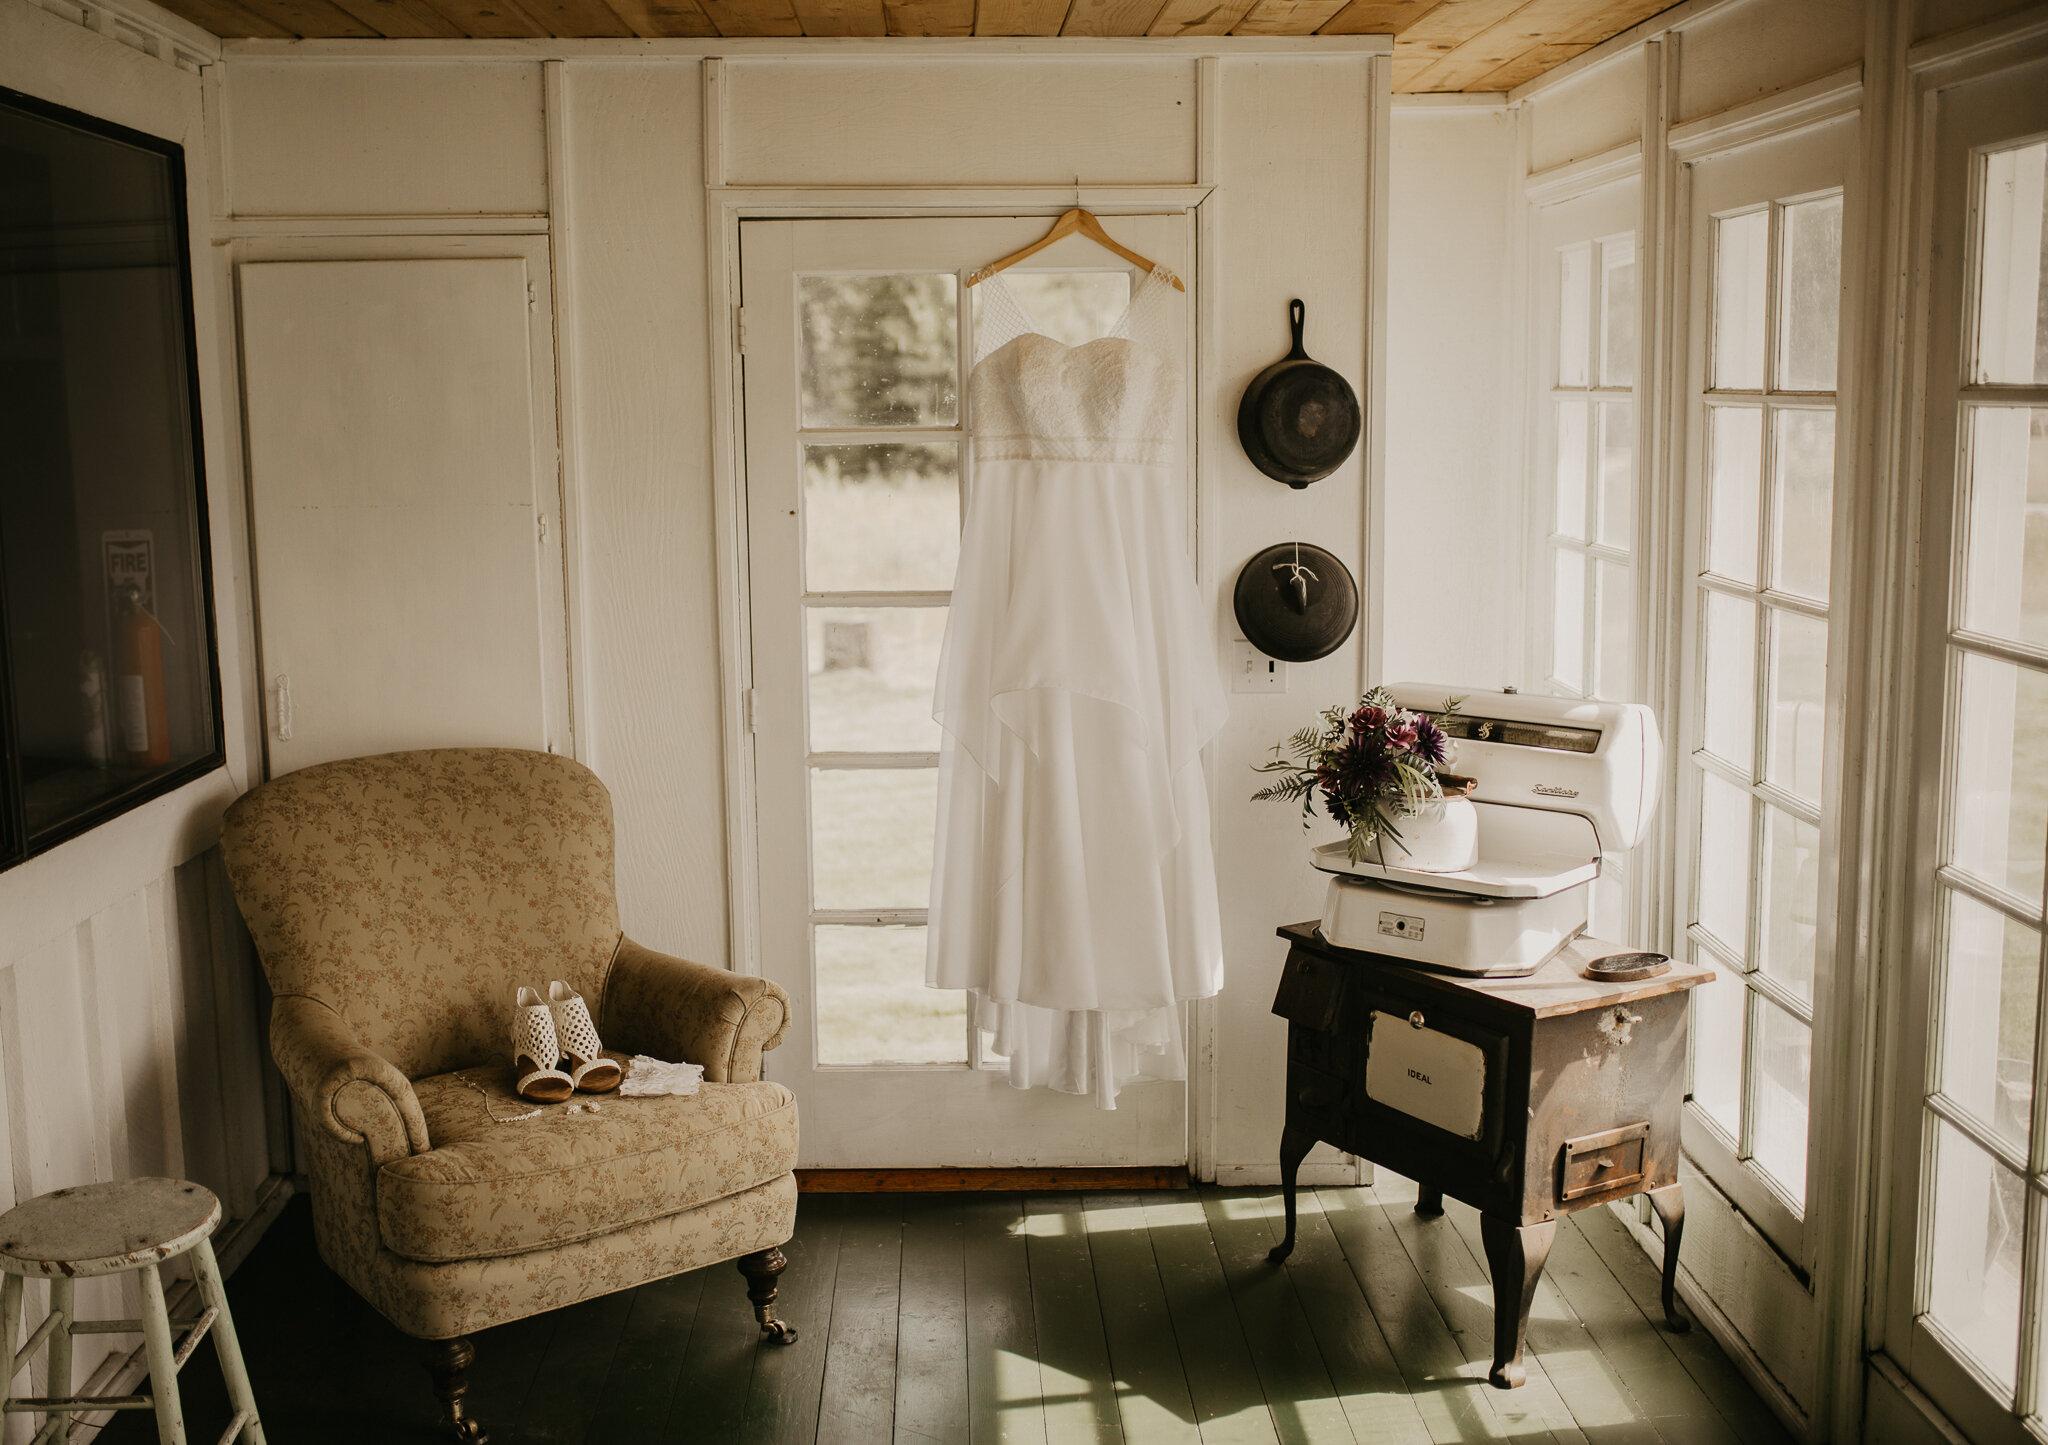 gown-ceremony-coeurdalene-idaho.jpg